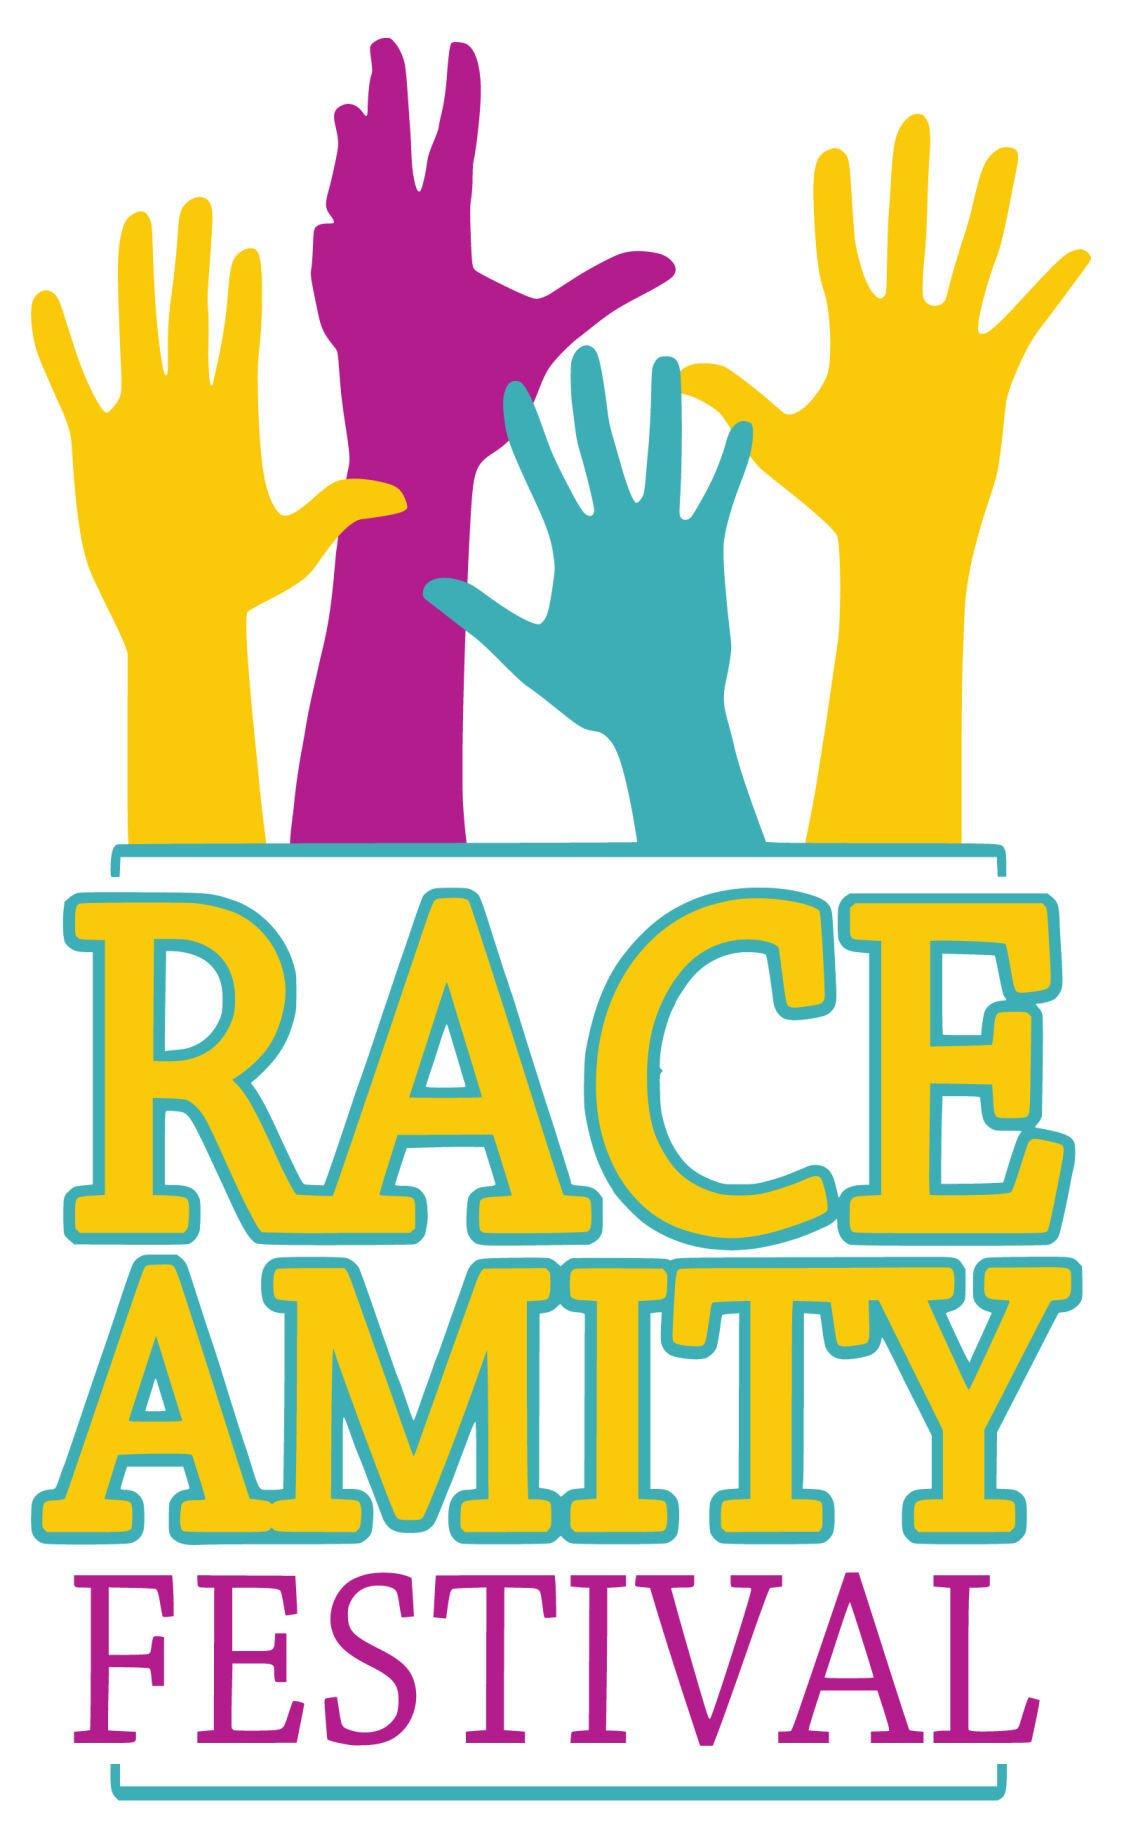 Race Amity Festival Logo (Vector)